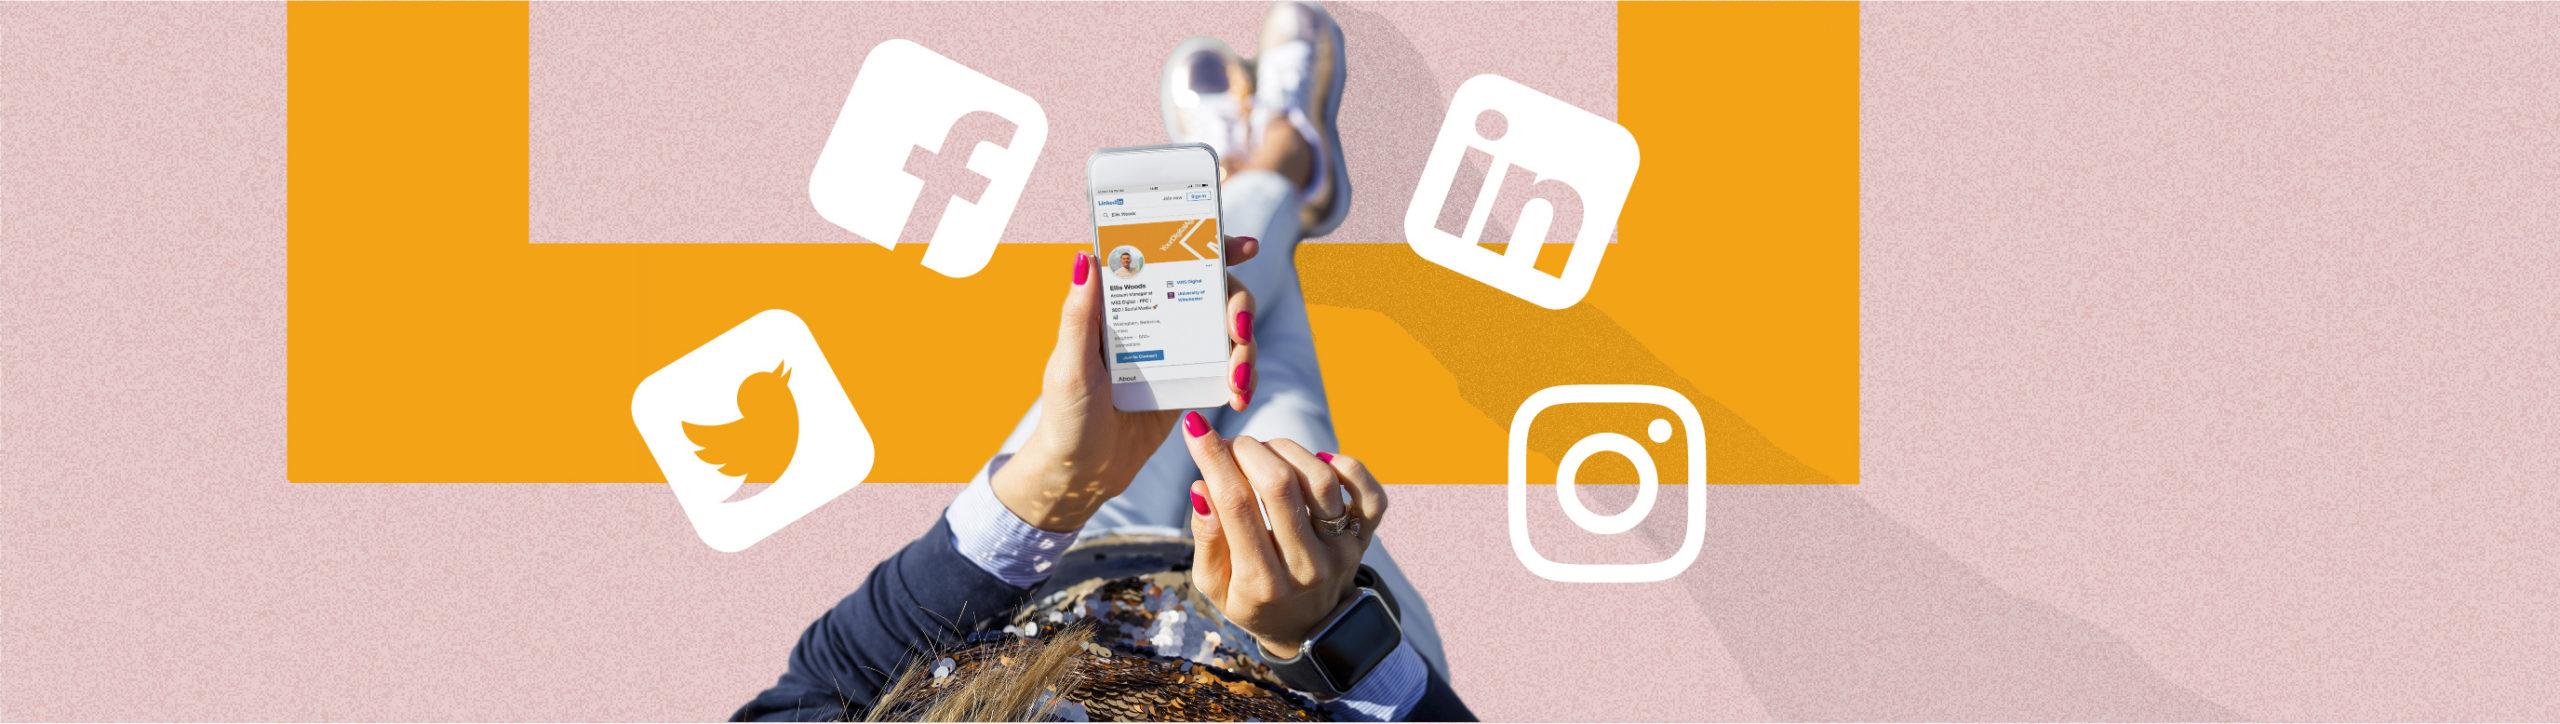 What Happened on Social Media in April 2021?